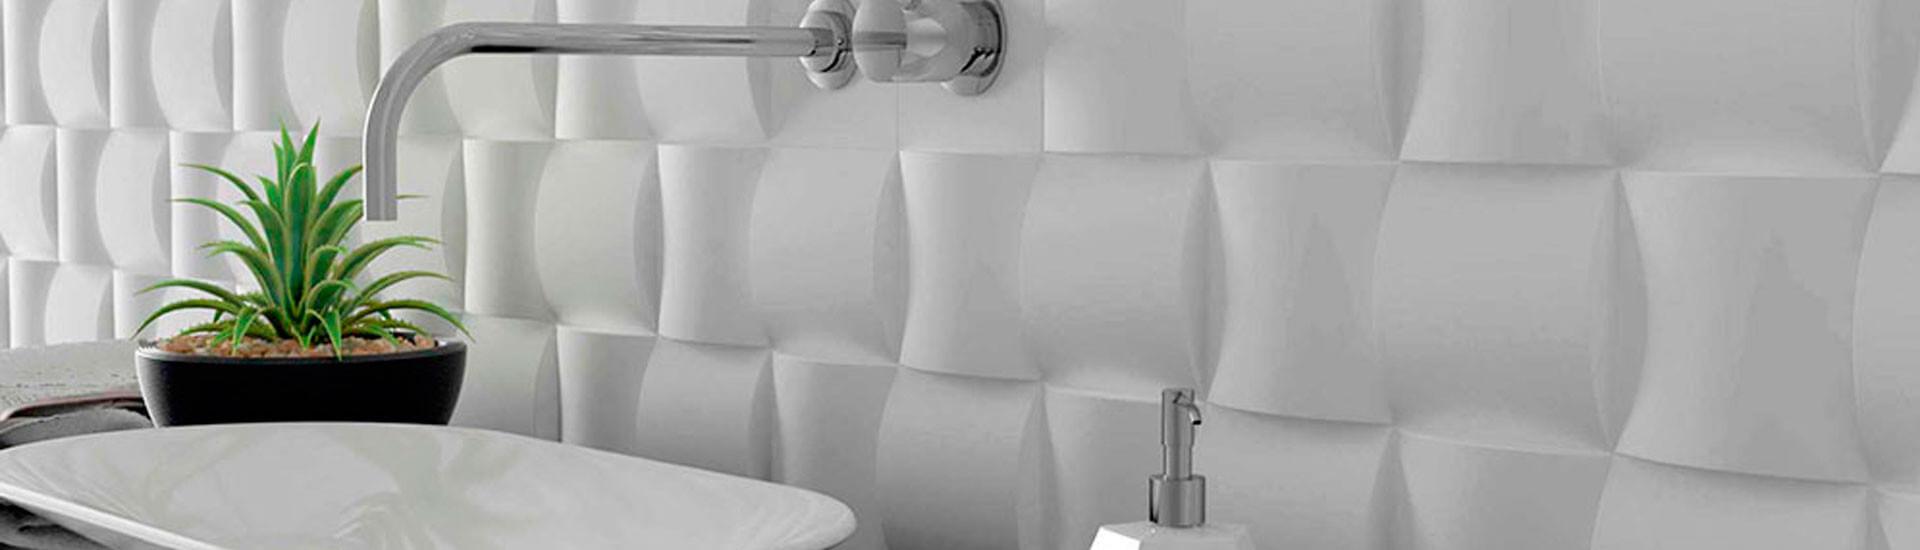 Sale of tiles and ceramic online. Online Tile Store - Ondacer S.L.